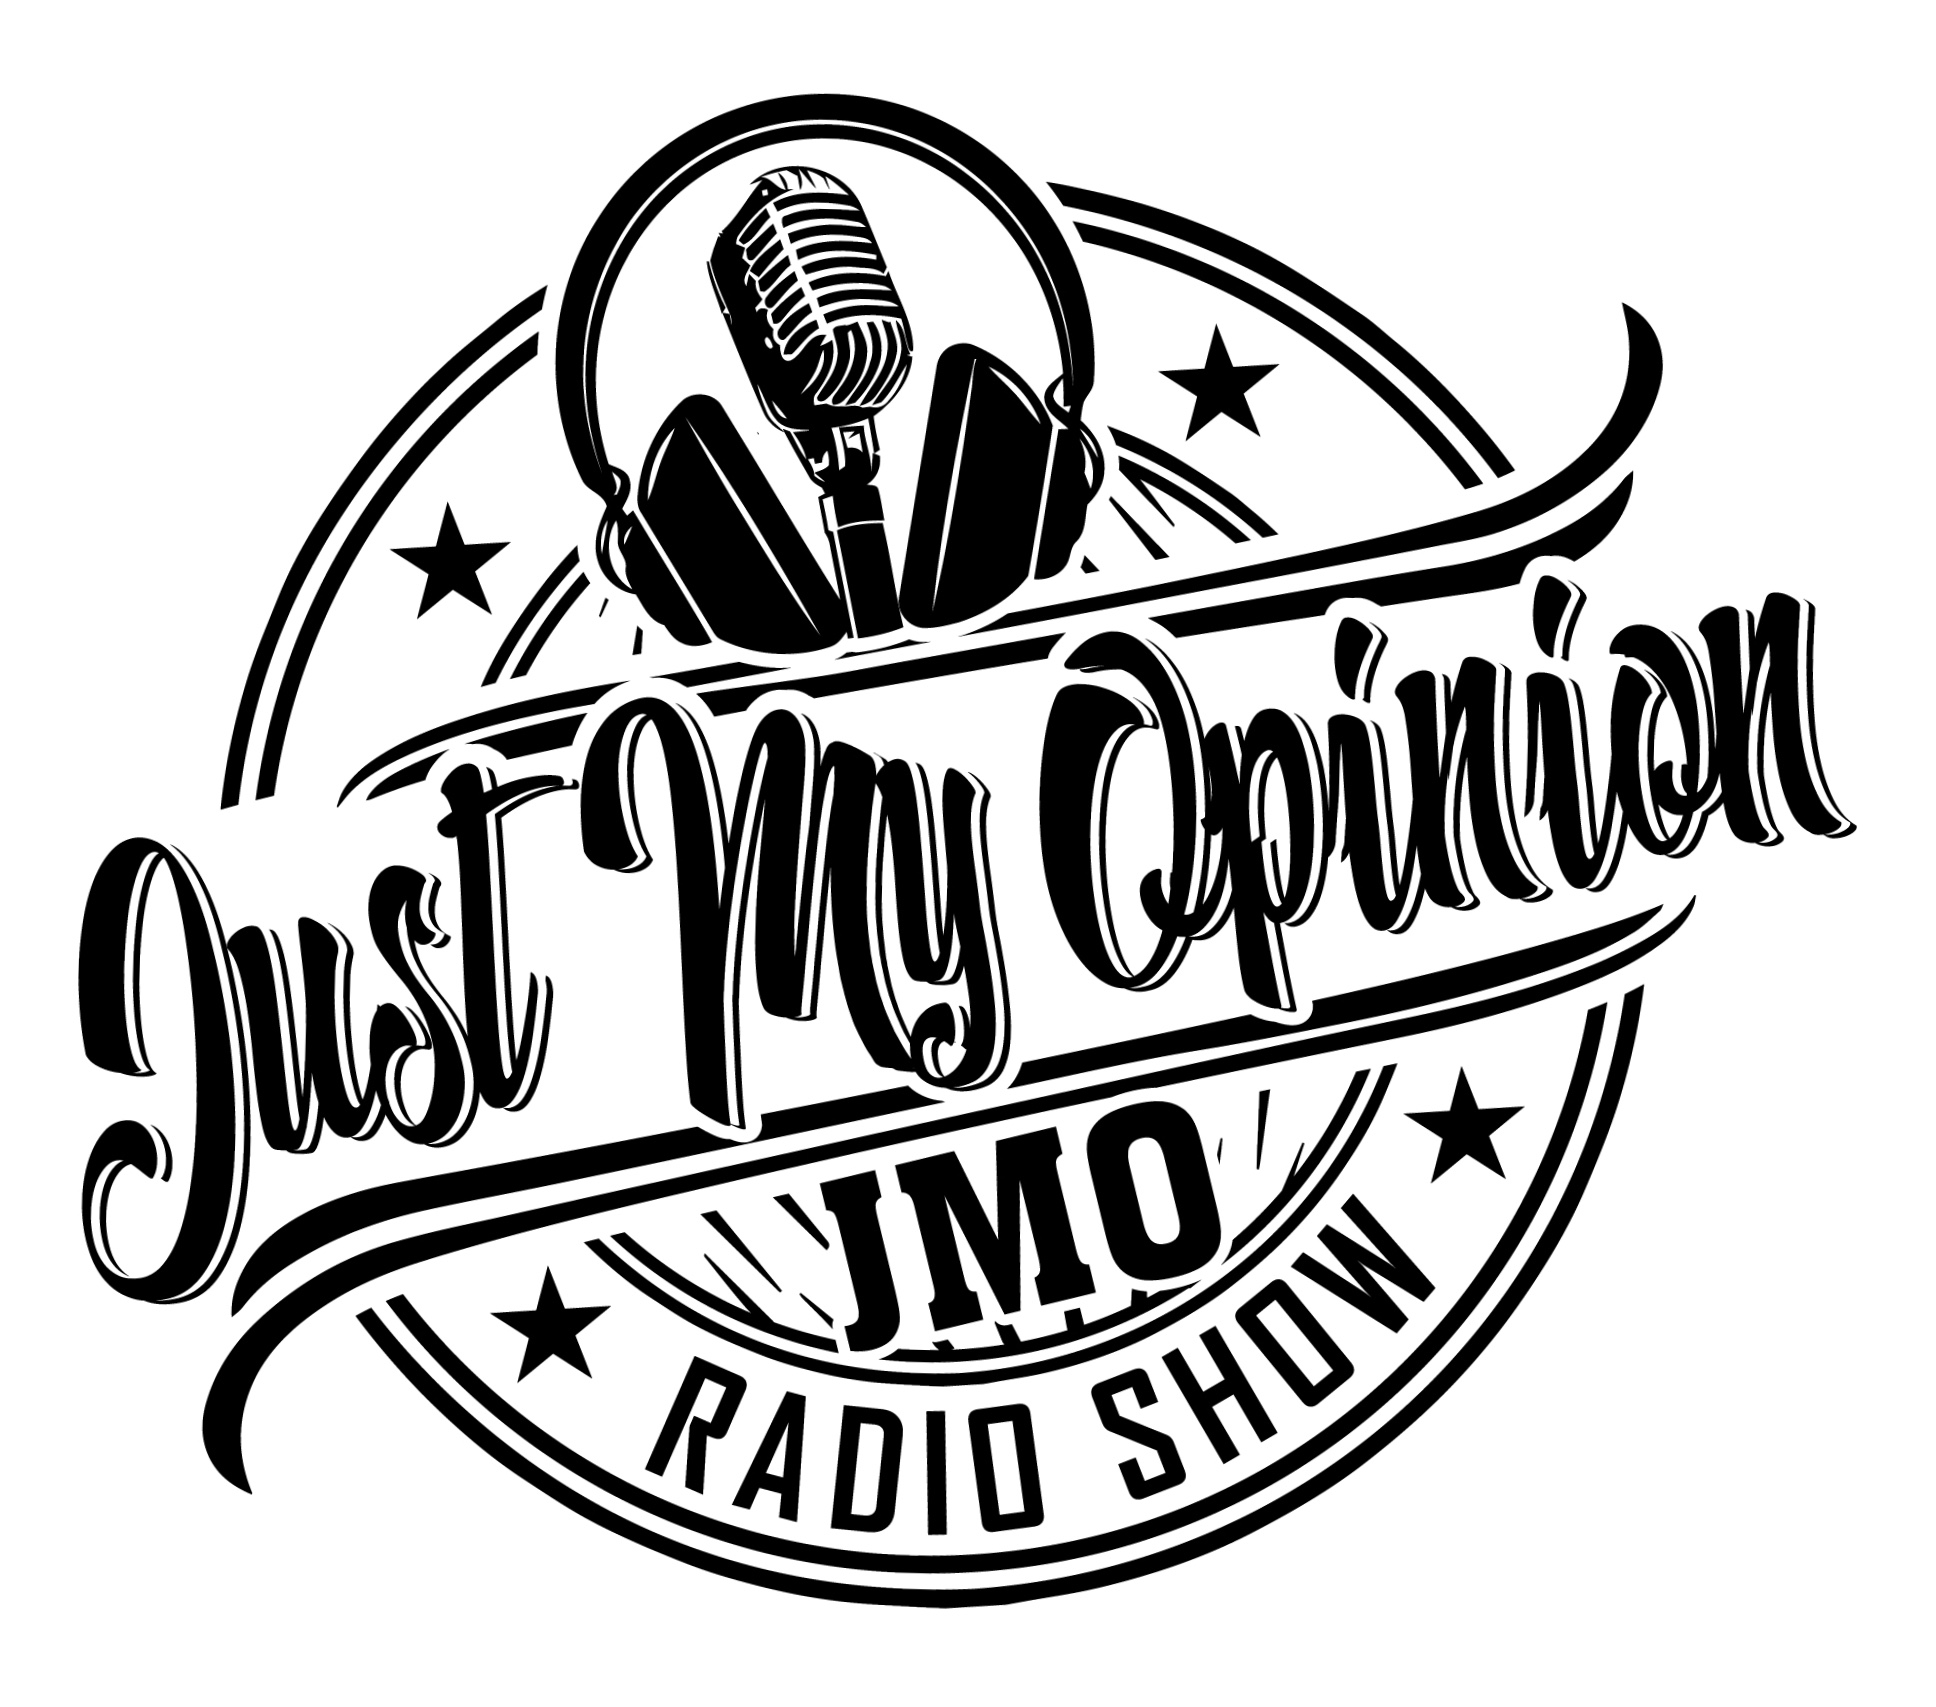 JMO Radio Show Image